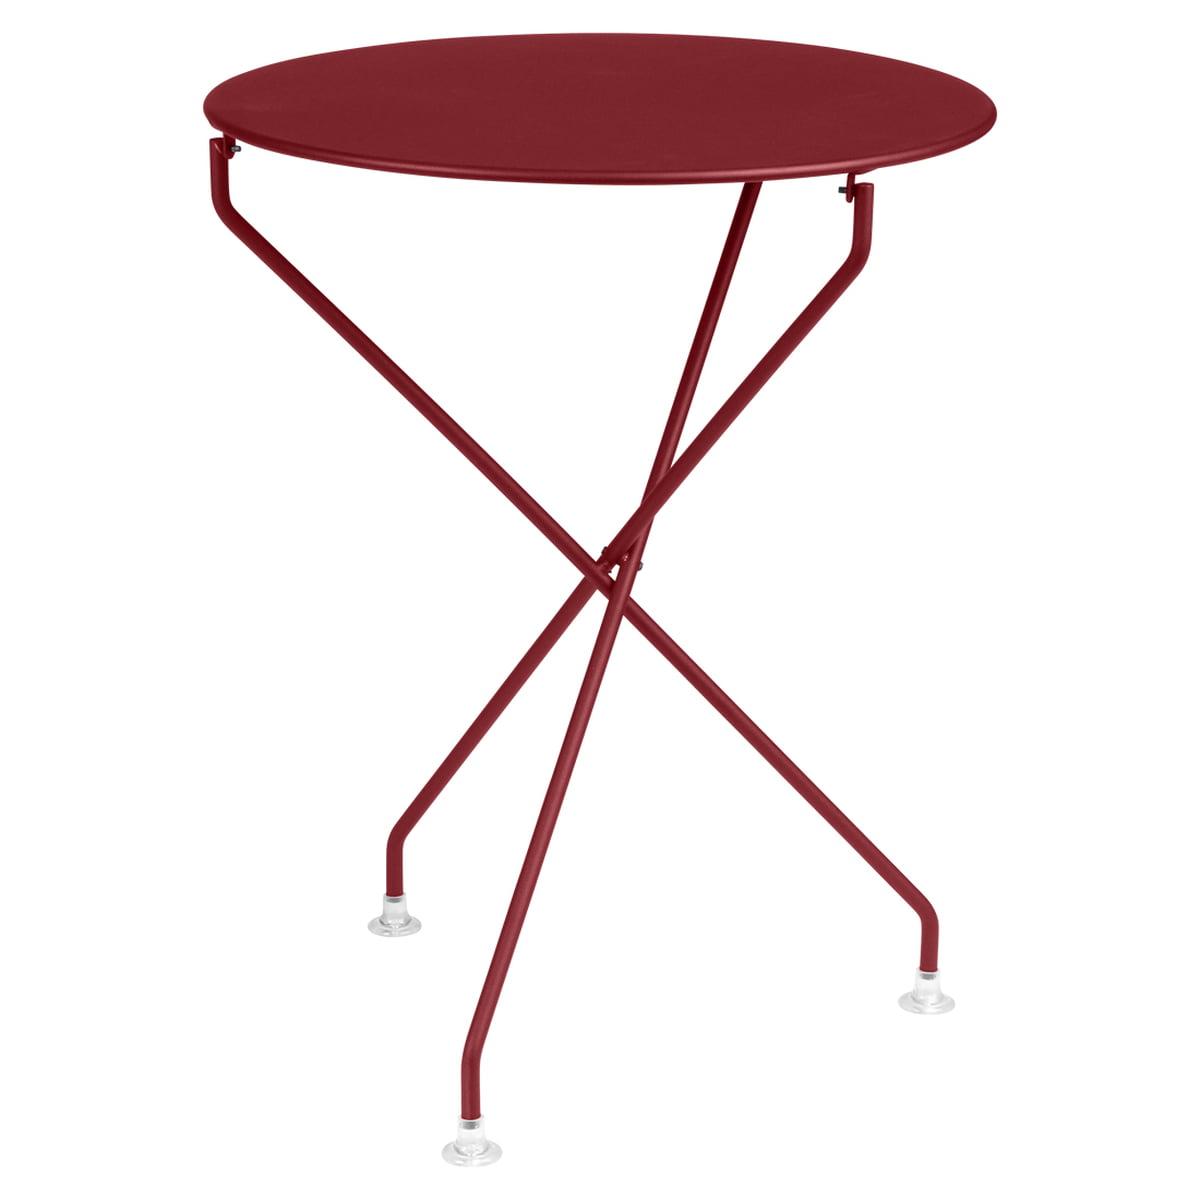 tertio table 60 cm by fermob connox shop. Black Bedroom Furniture Sets. Home Design Ideas